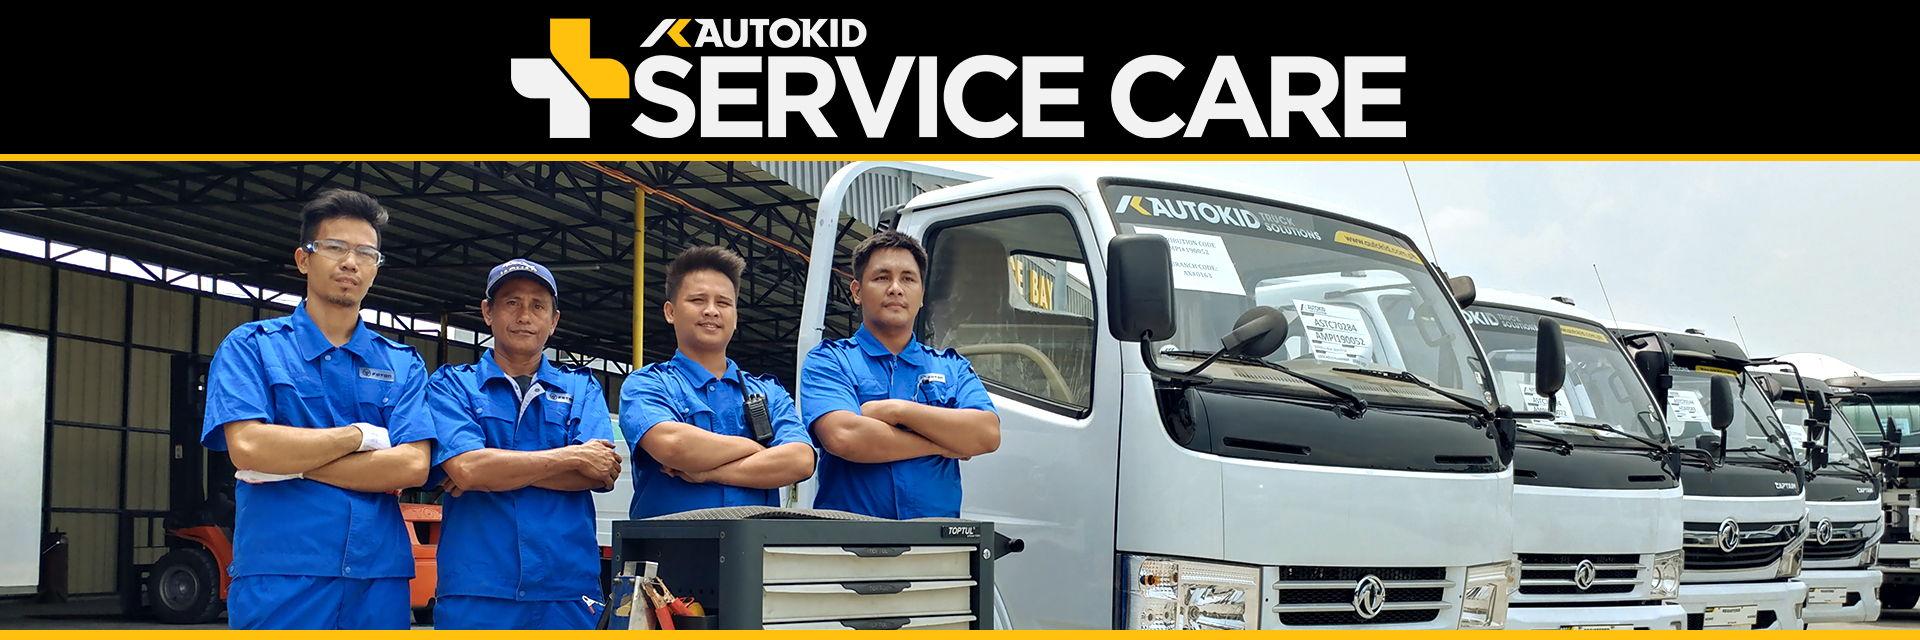 Autokid Service Care Banner Mobile